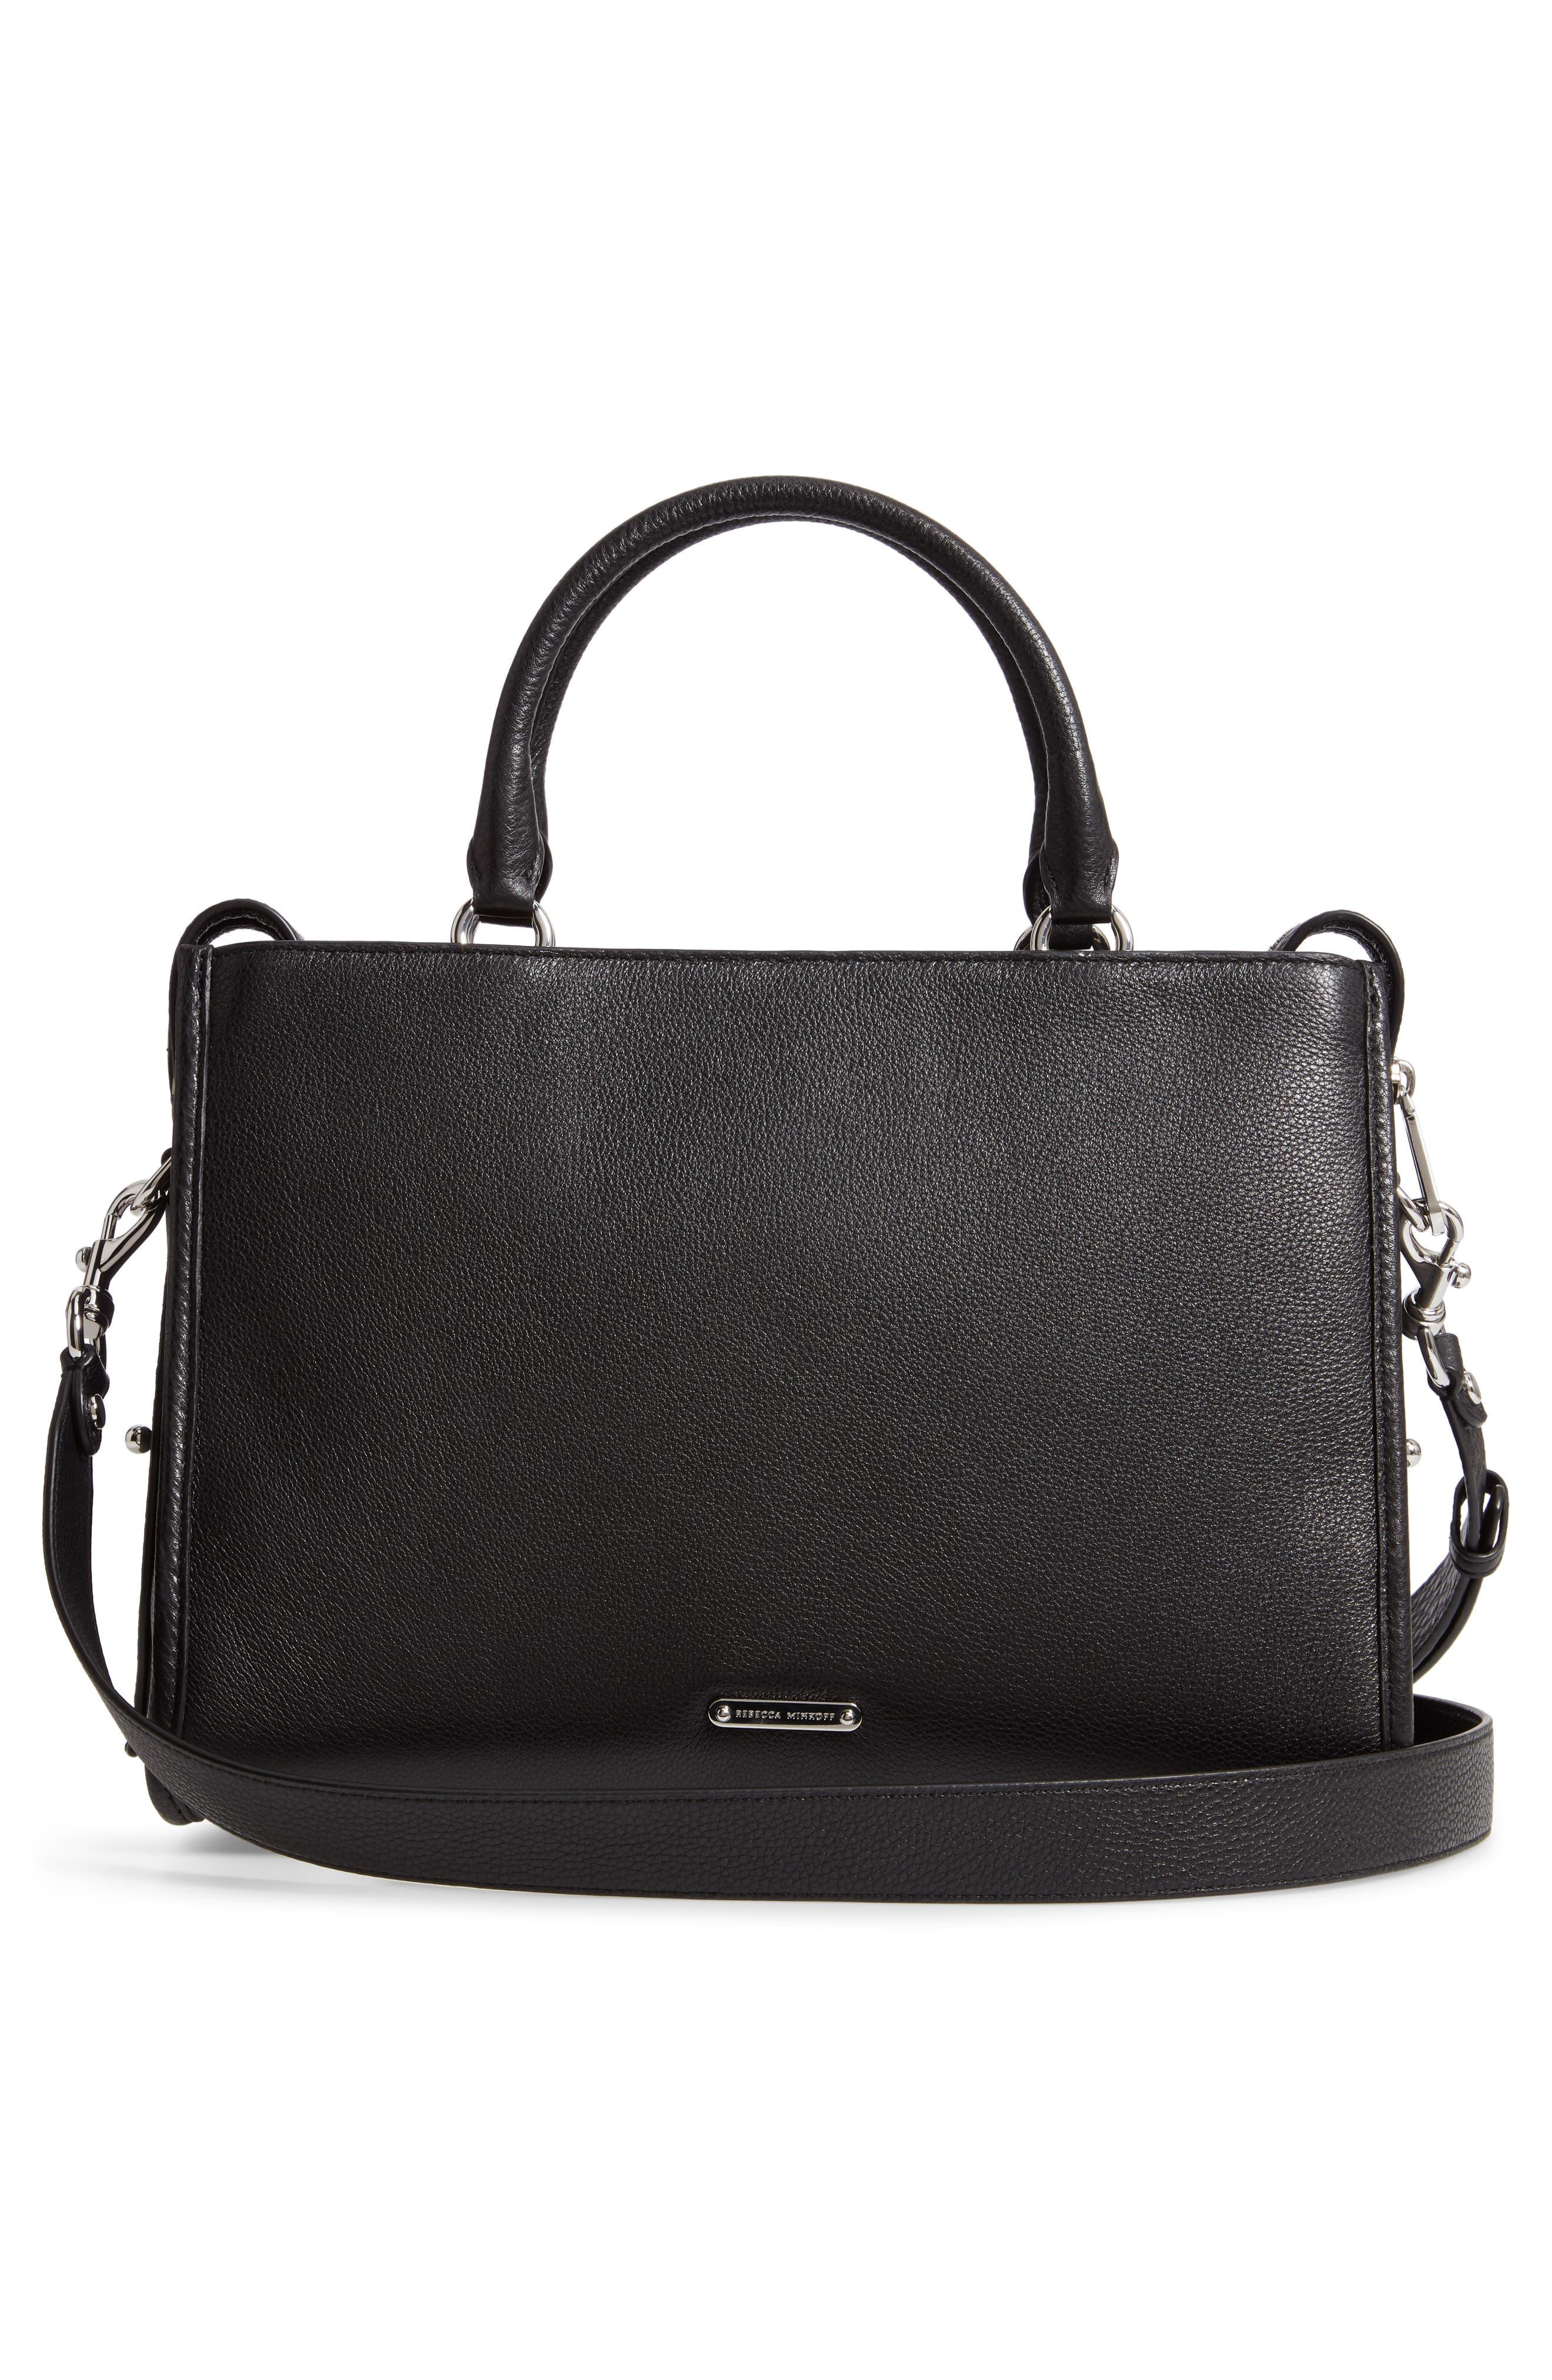 REBECCA MINKOFF, Bedford Zip Leather Satchel, Alternate thumbnail 4, color, BLACK